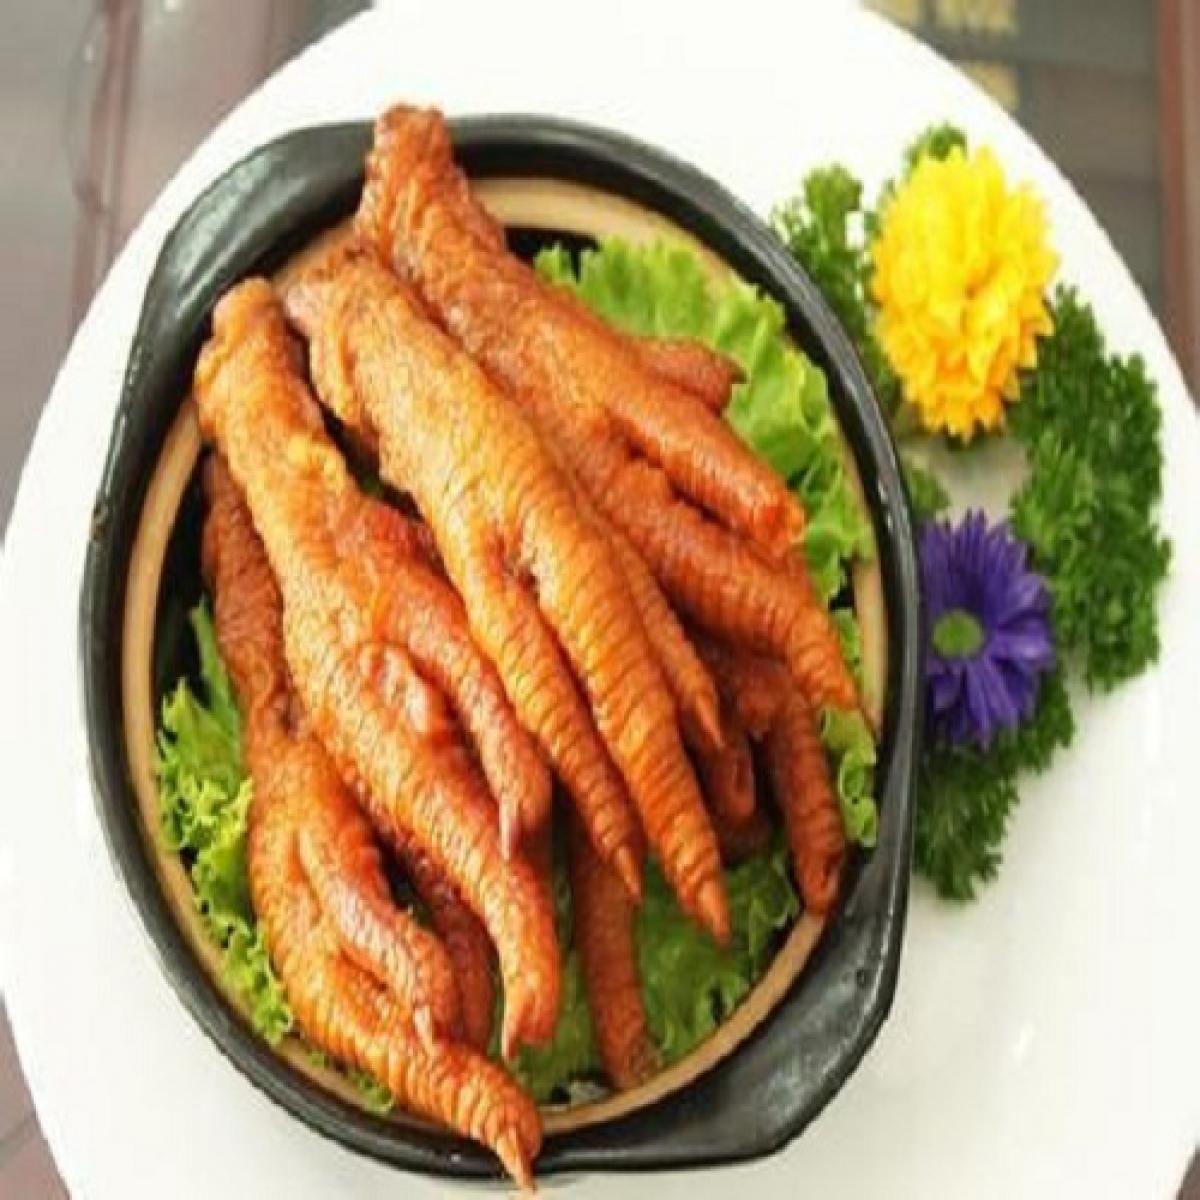 куриные лапки по-китайски рецепт с фото